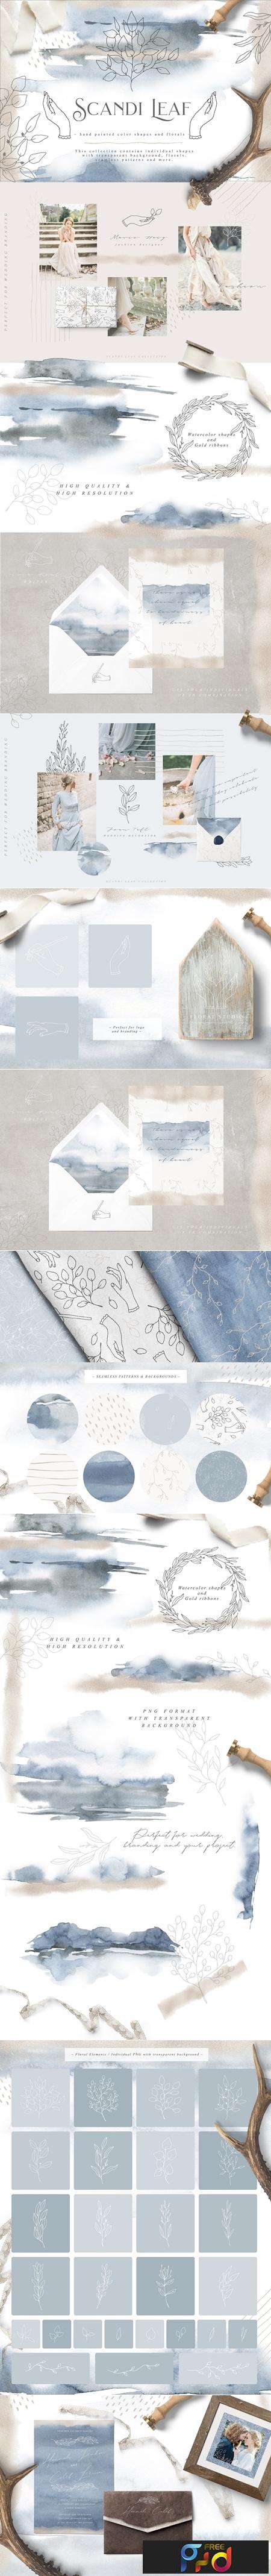 Scandi Leaf Collection 2615575 1